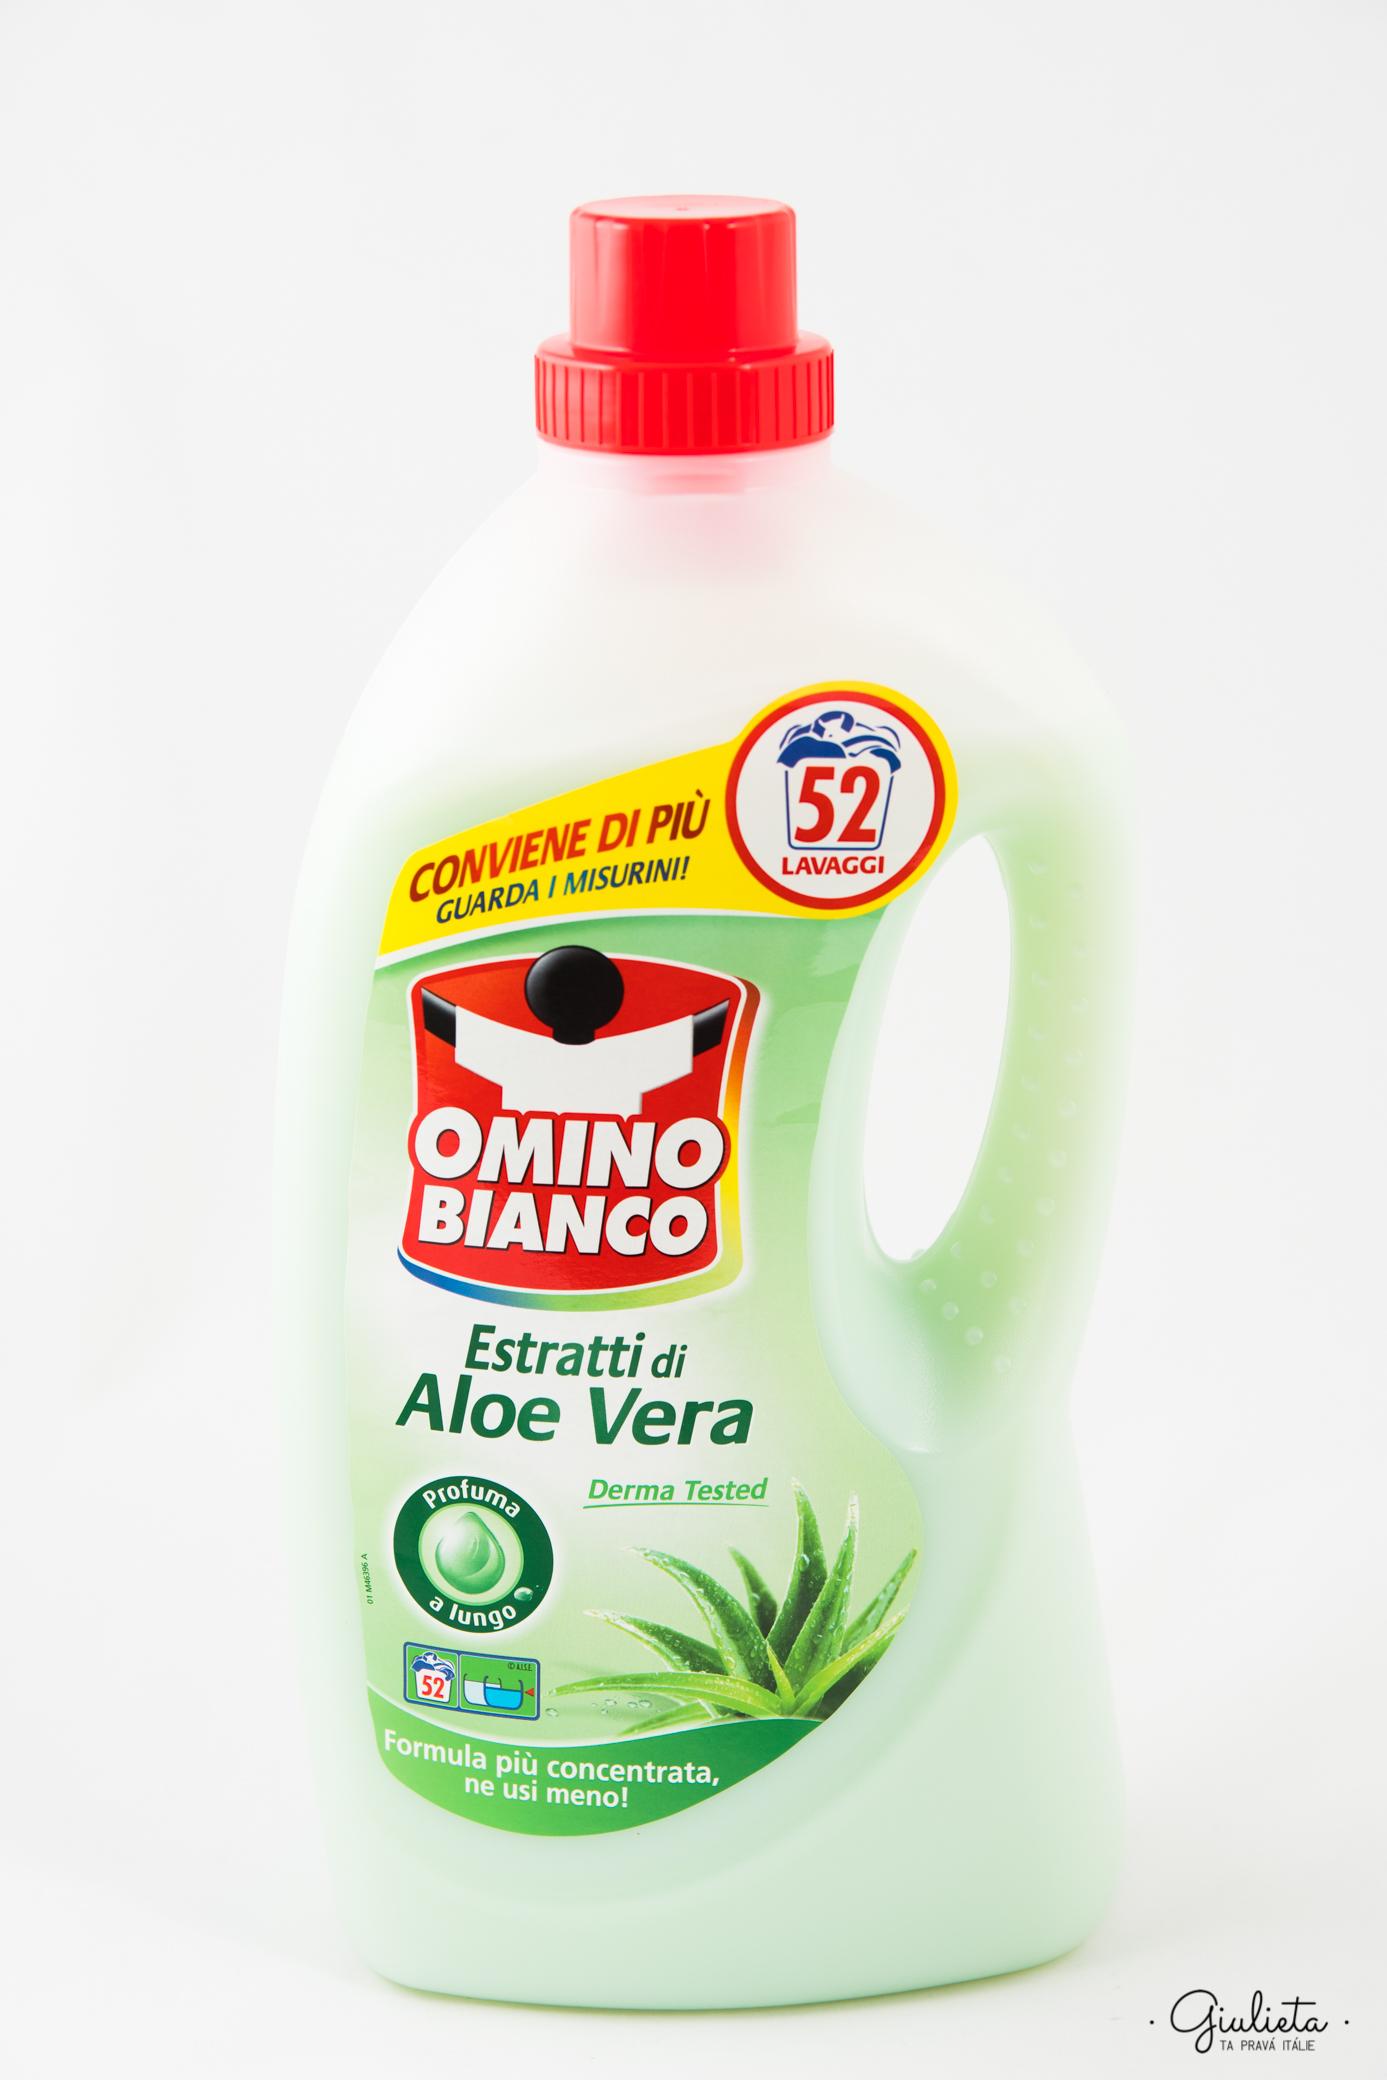 Omino Bianco prací gel Aloe Vera, 52 pracích dávek